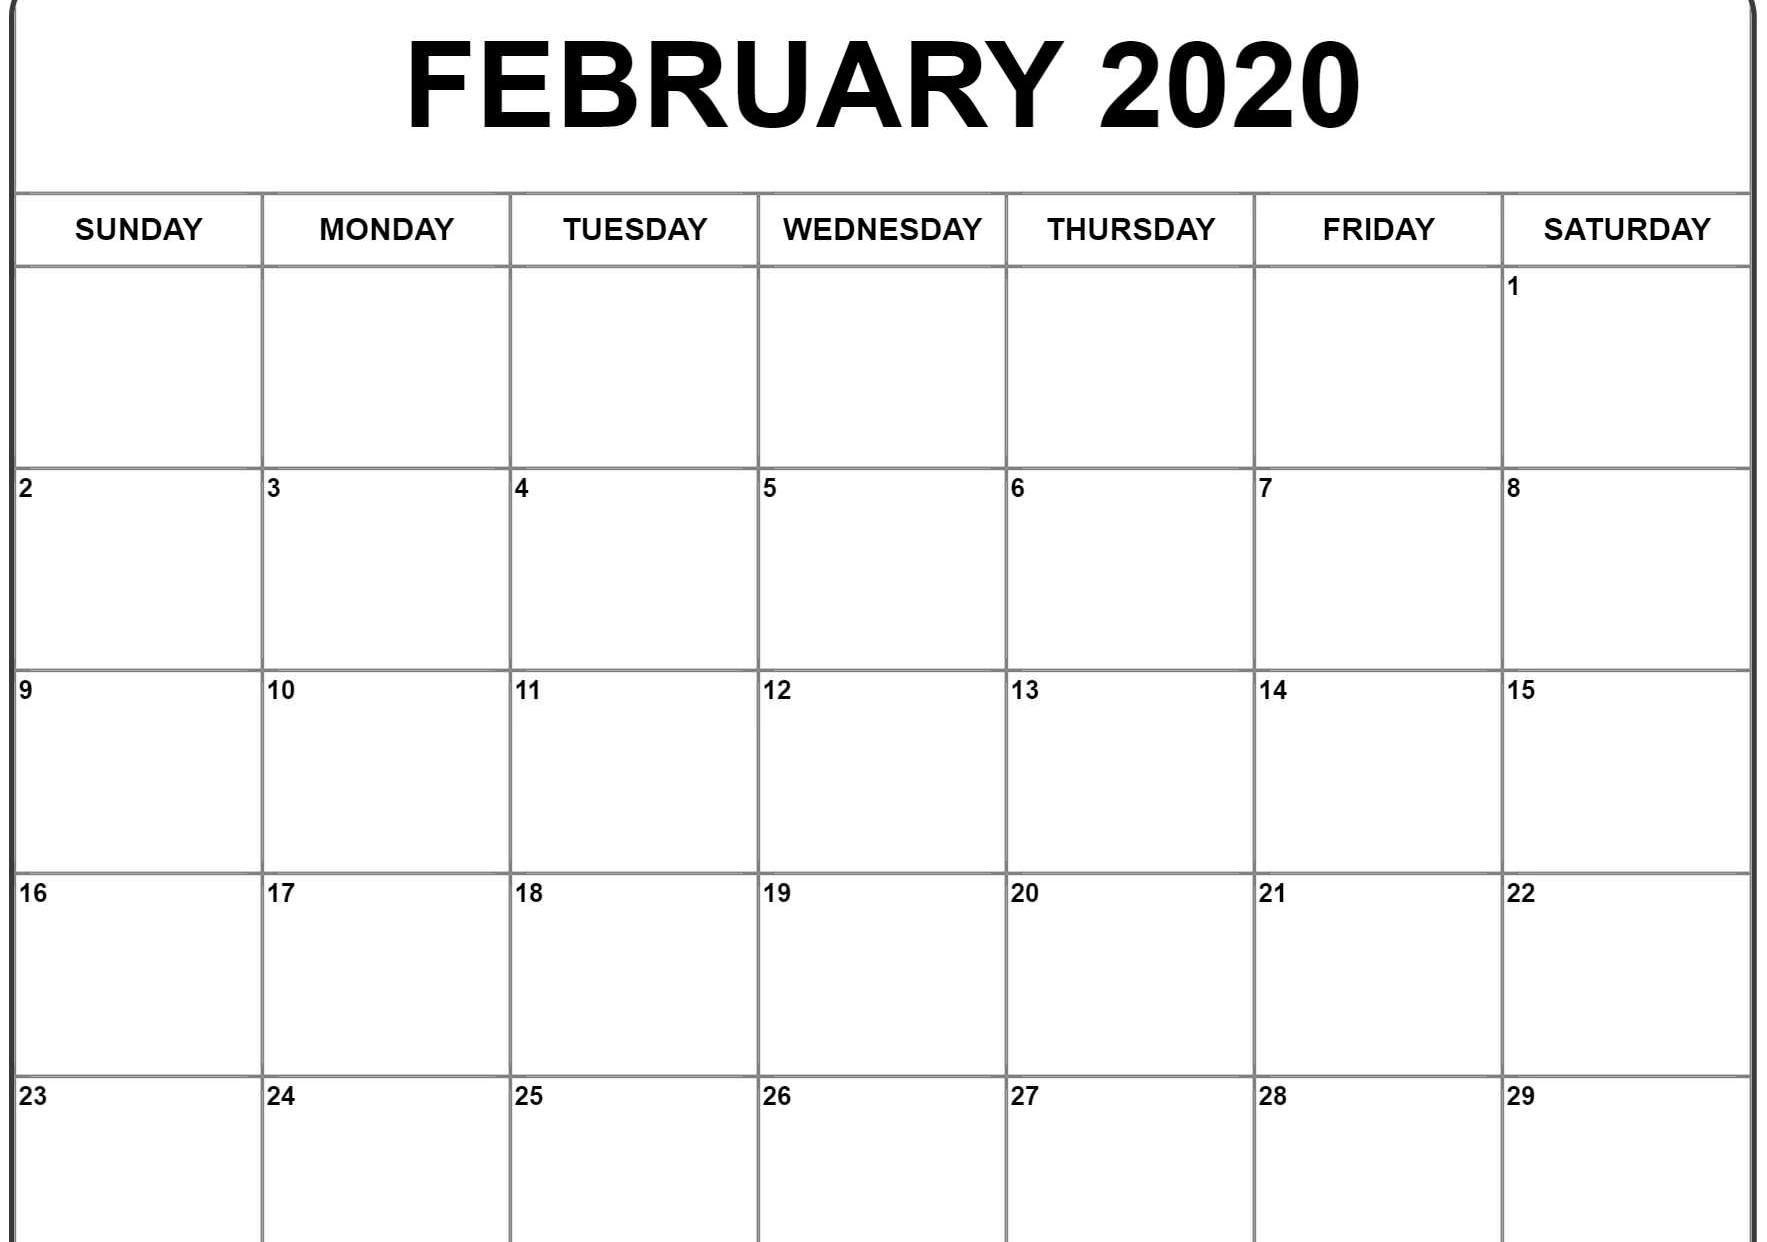 February 2020 Calendar Pdf, Word, Excel Printable Template-2020 Calendar Excel Template